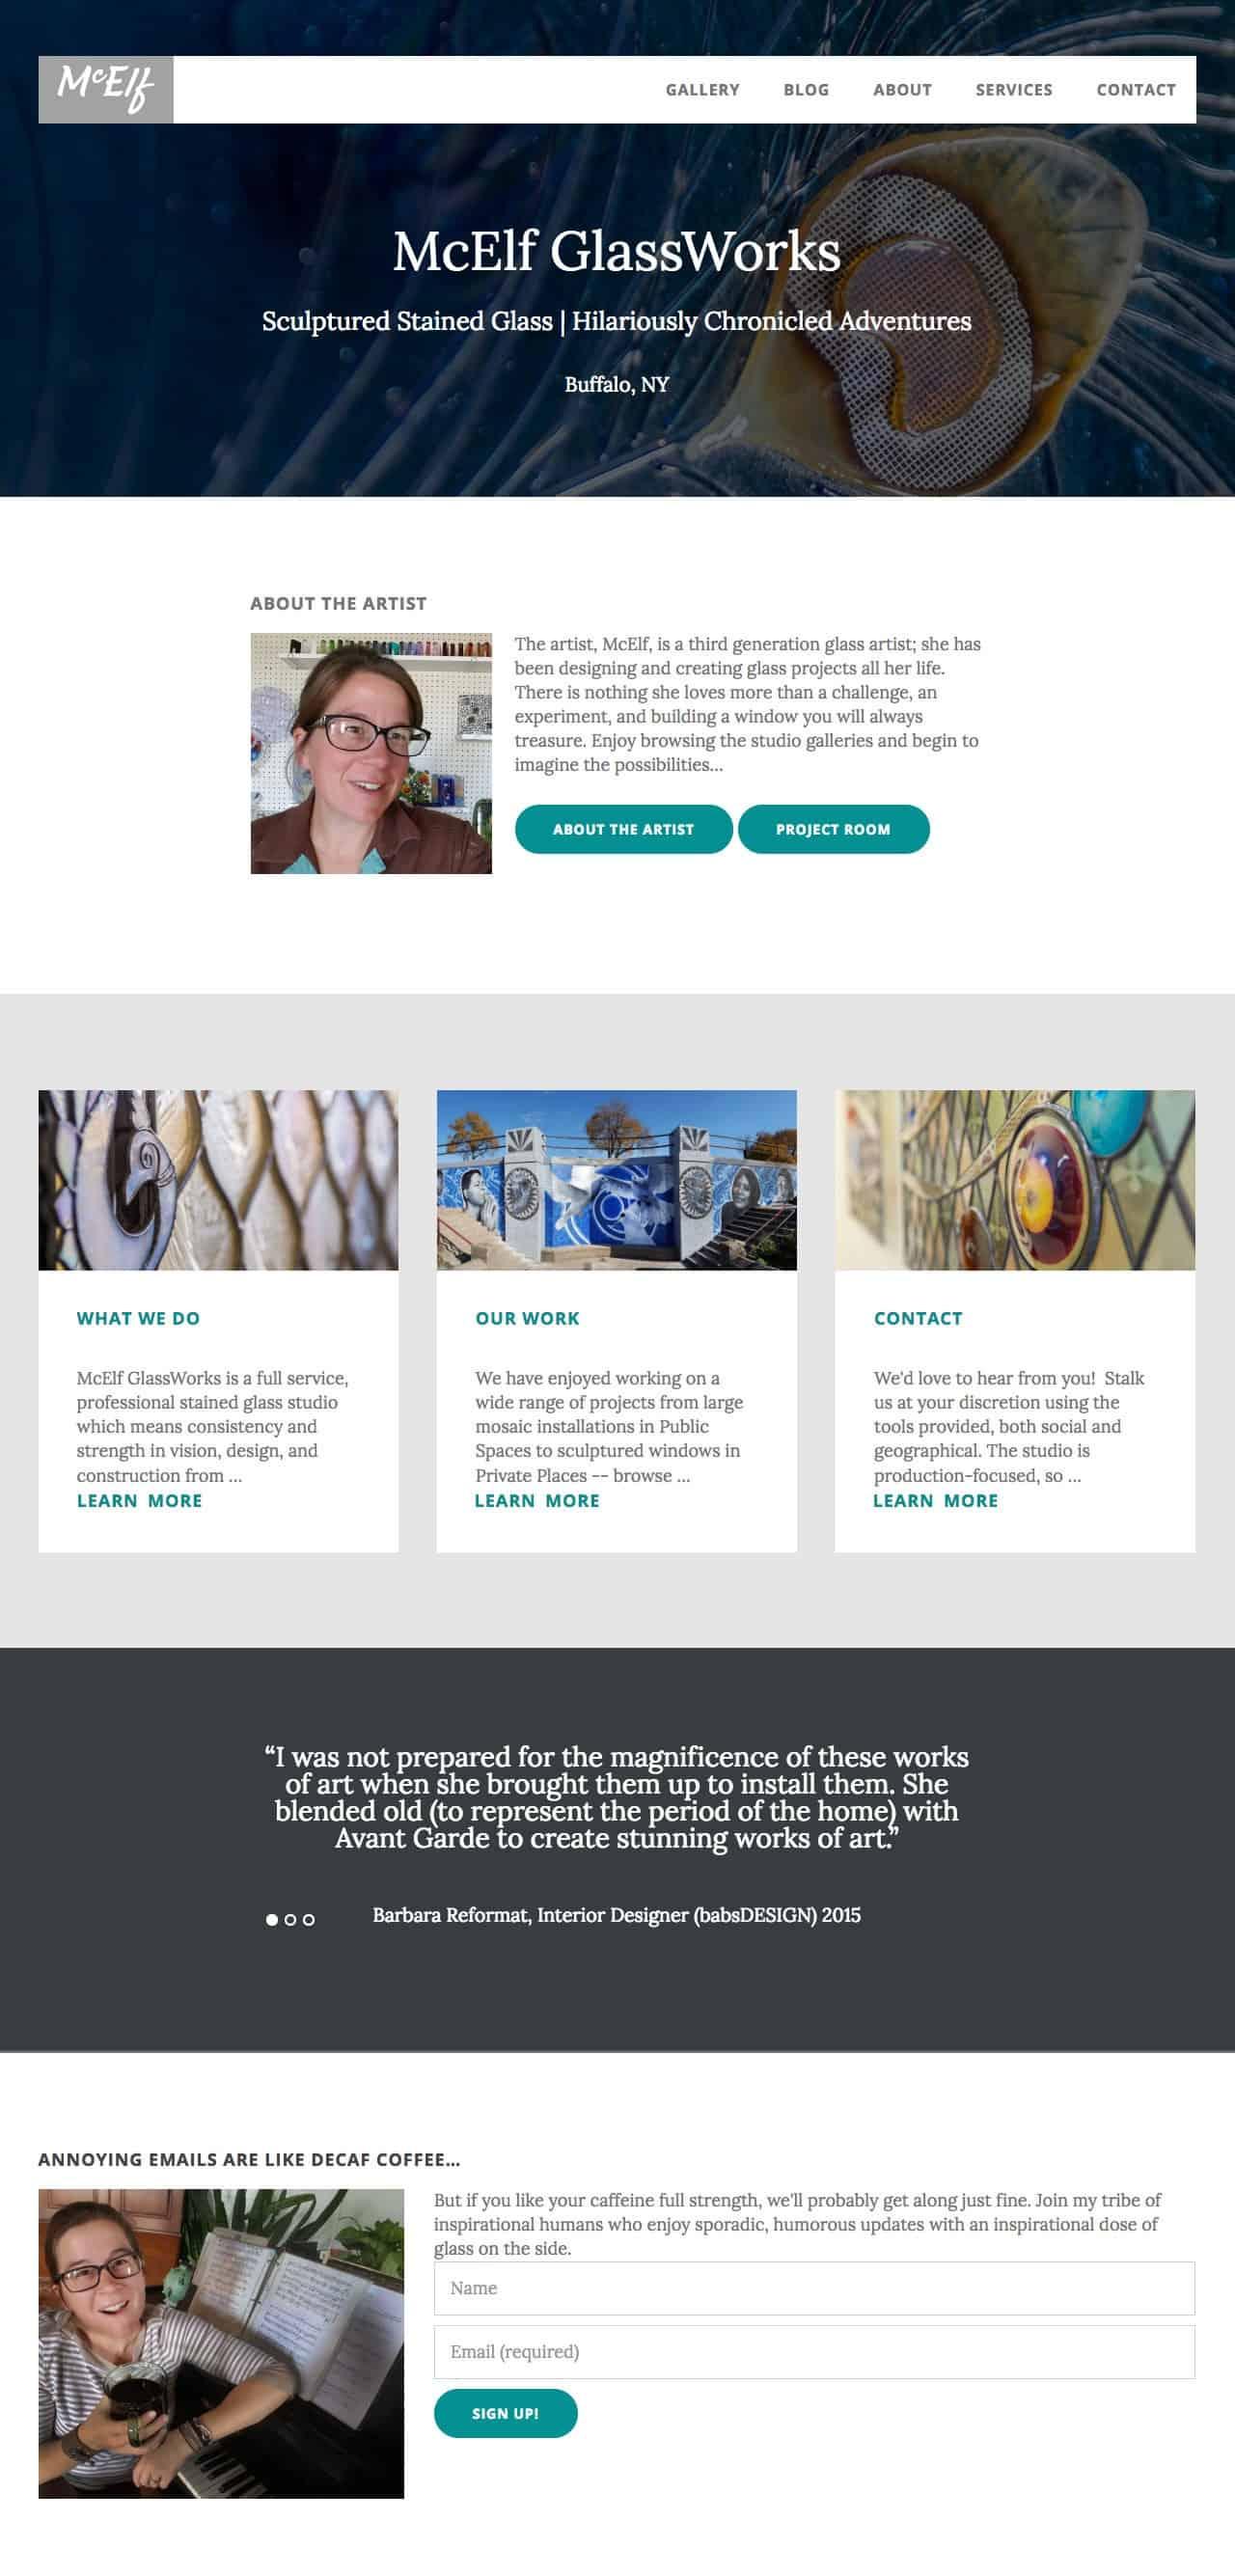 McElf GlassWorks